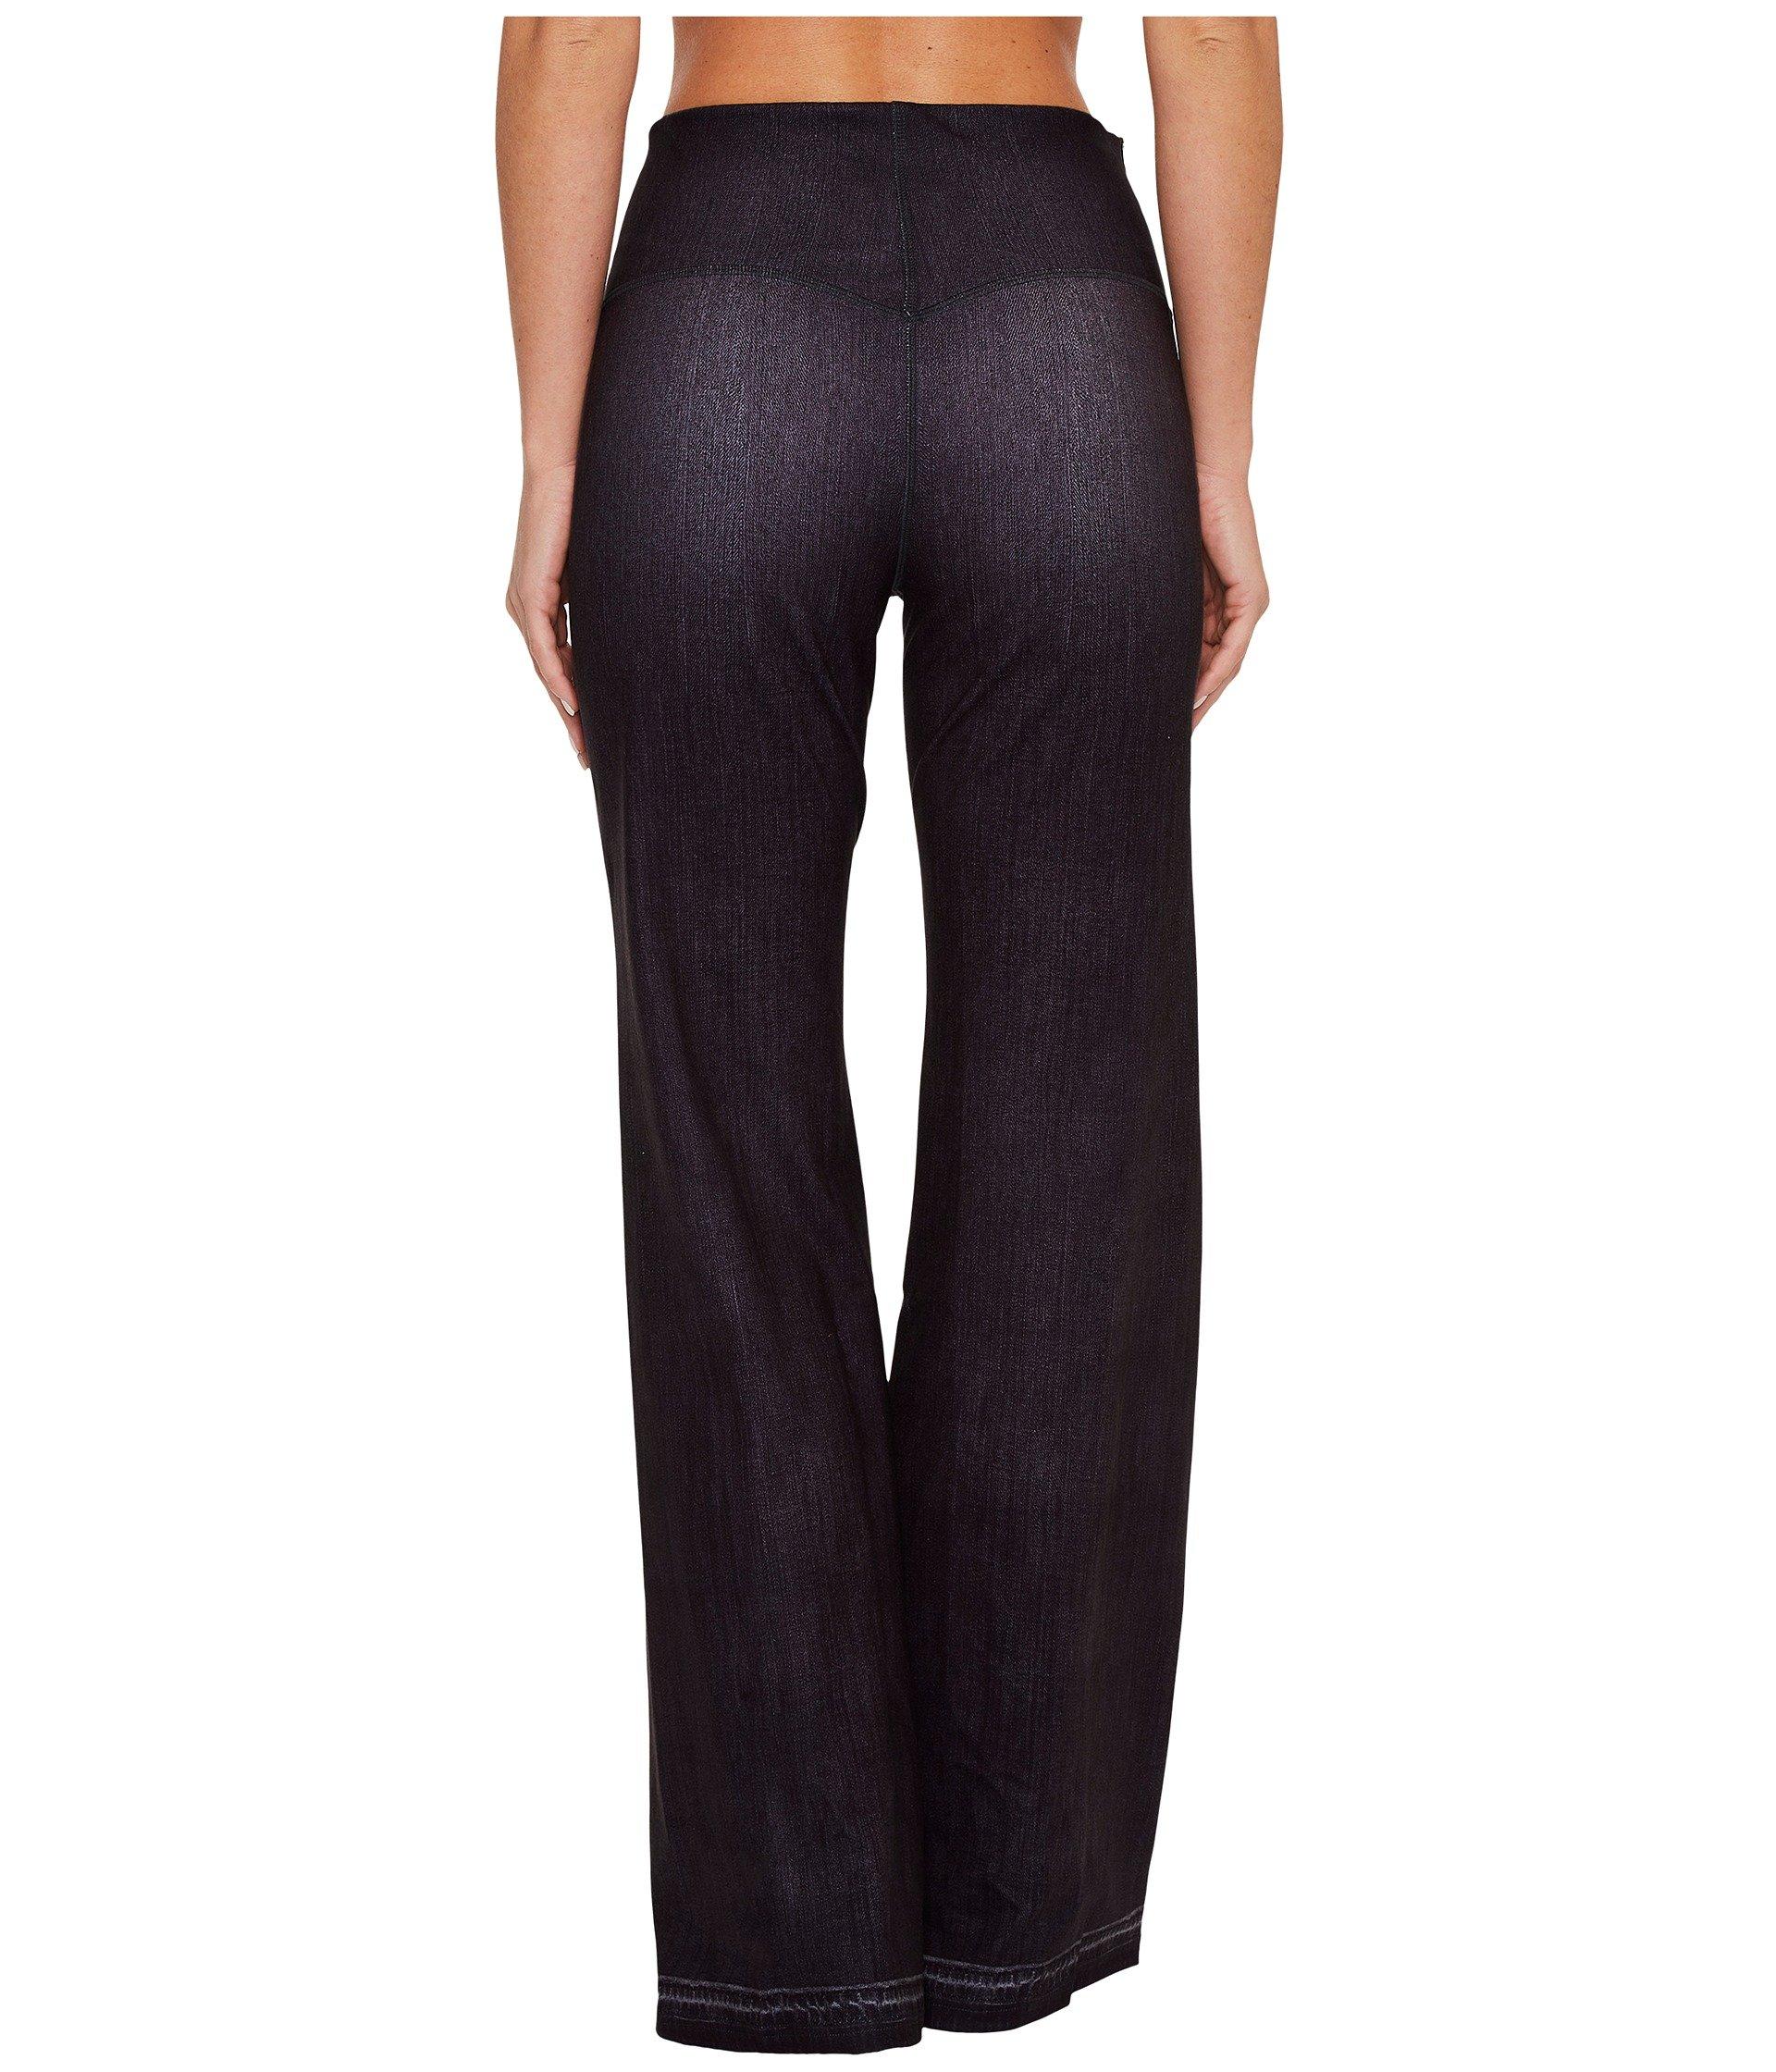 Lucy Women's Indigo Flare Pants Black Indigo Pants by Lucy (Image #4)